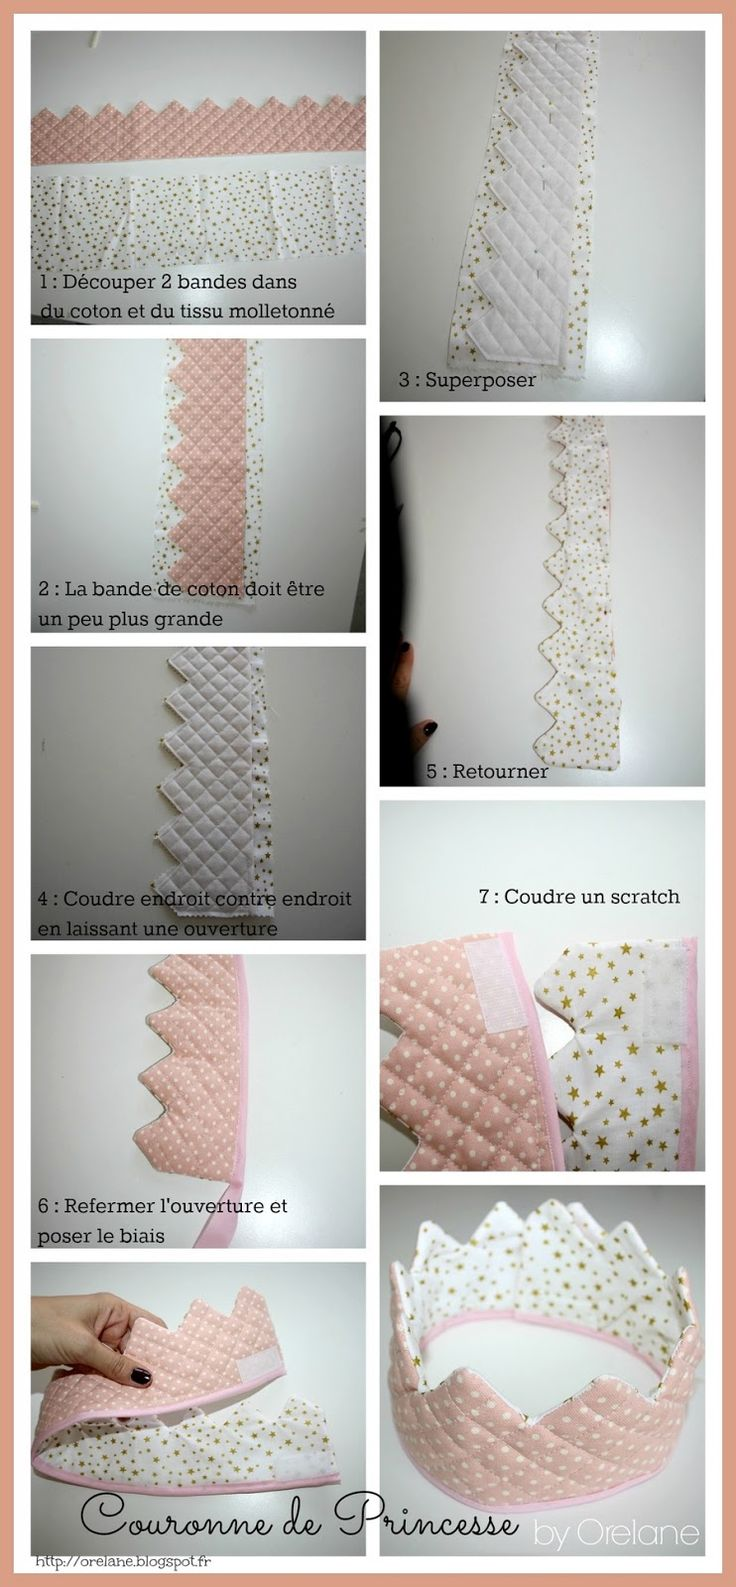 ♥ DIY : Couronne de princesse en tissu ♥  http://orelane.blogspot.fr/2013/06/diy-couronne-de-princesse-en-tissu.html